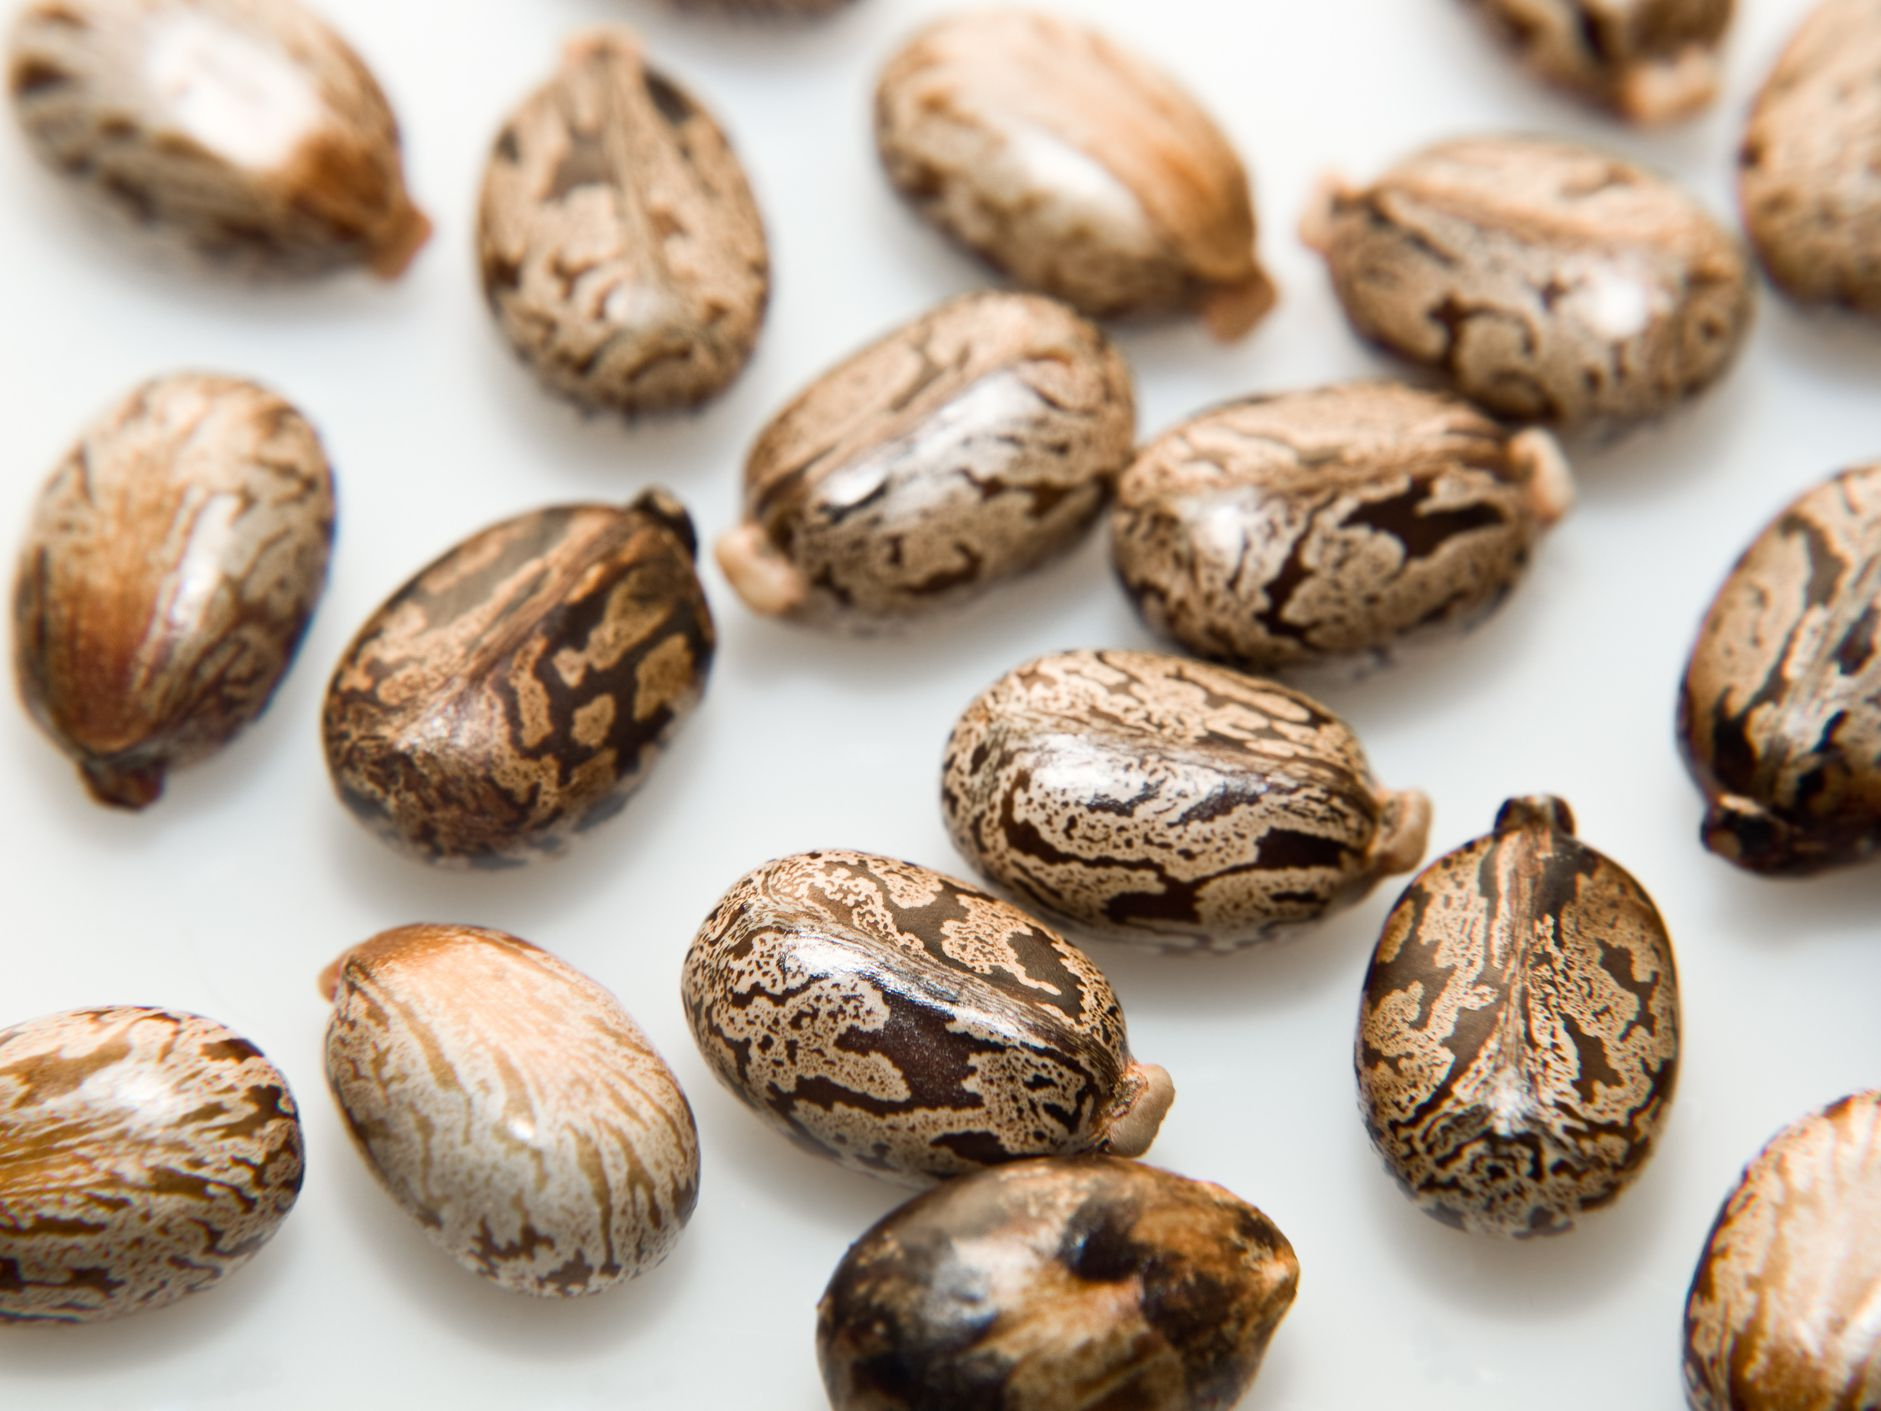 Ricin And Rca Castor Bean Toxin Information